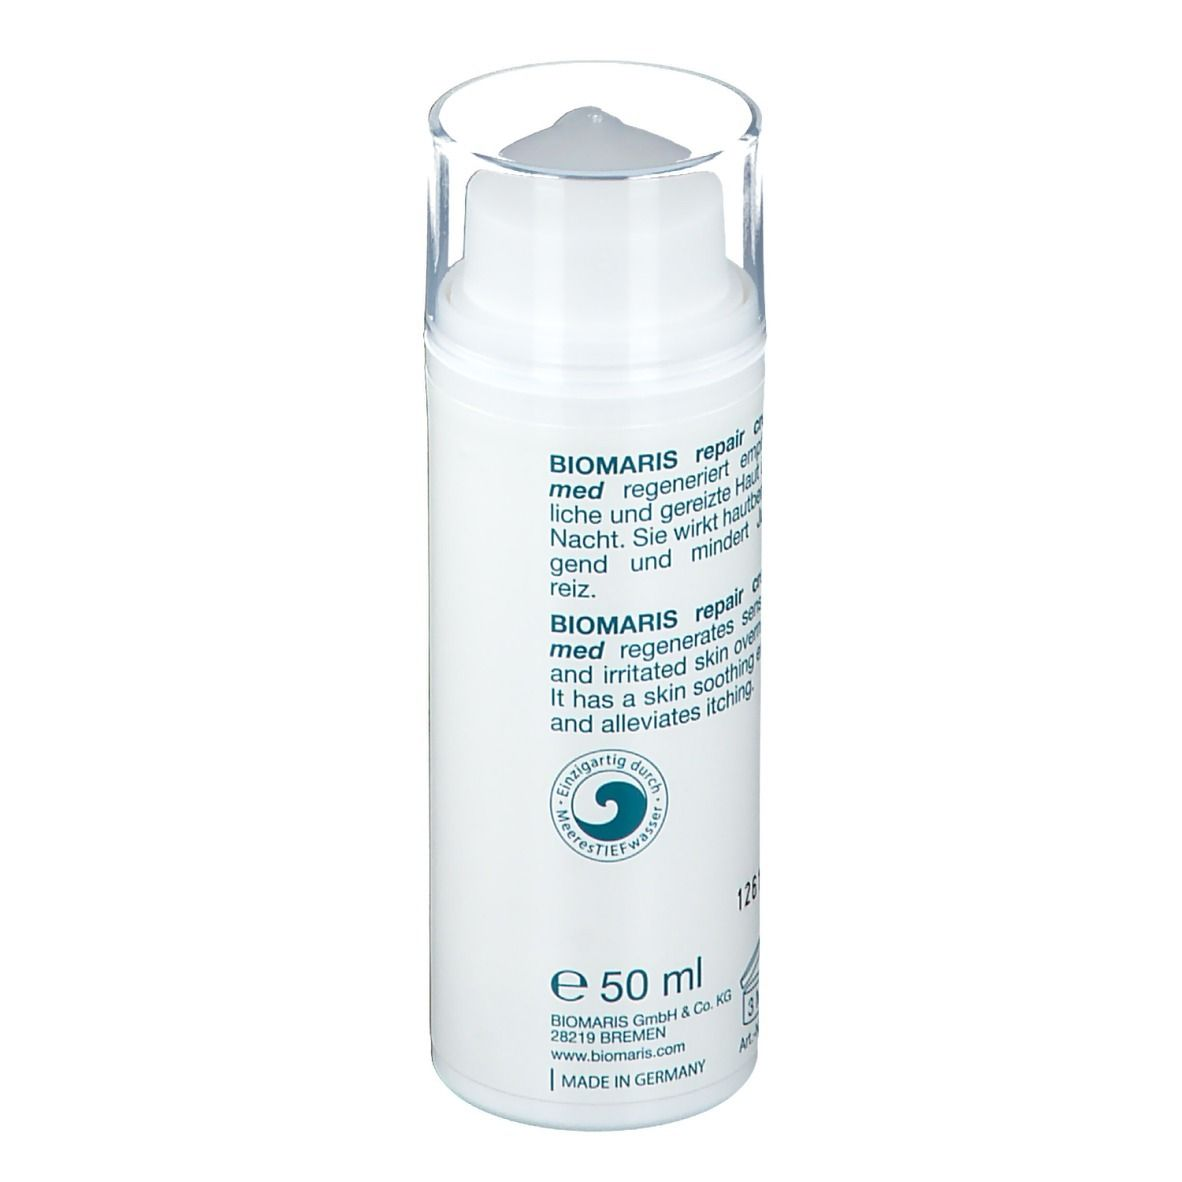 BIOMARIS® repair cream med